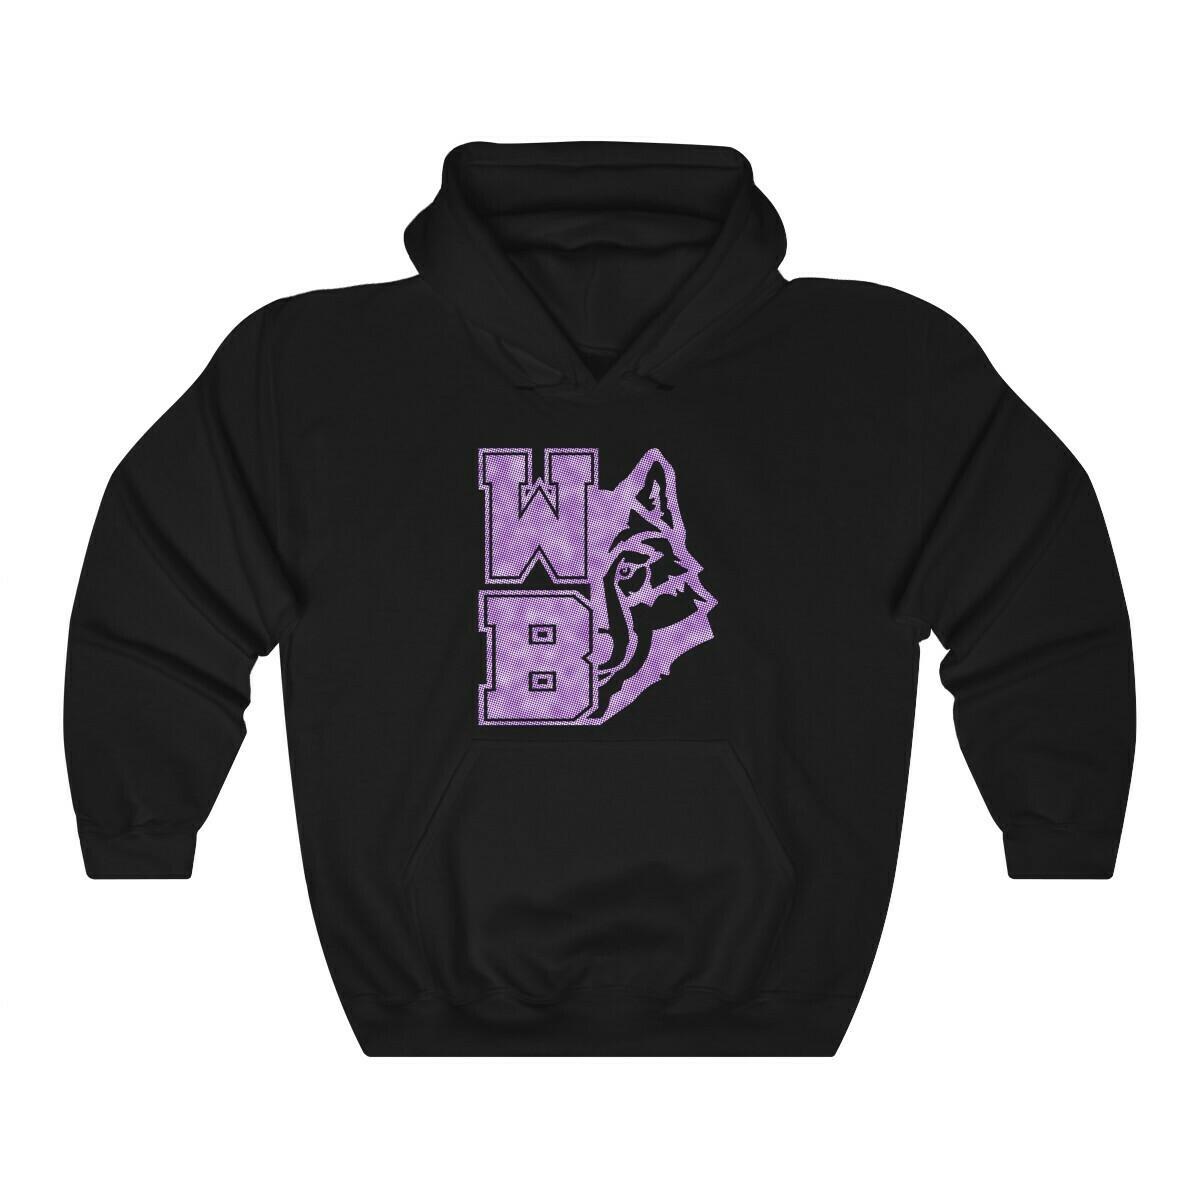 *WB wolf - purple/white - 18500